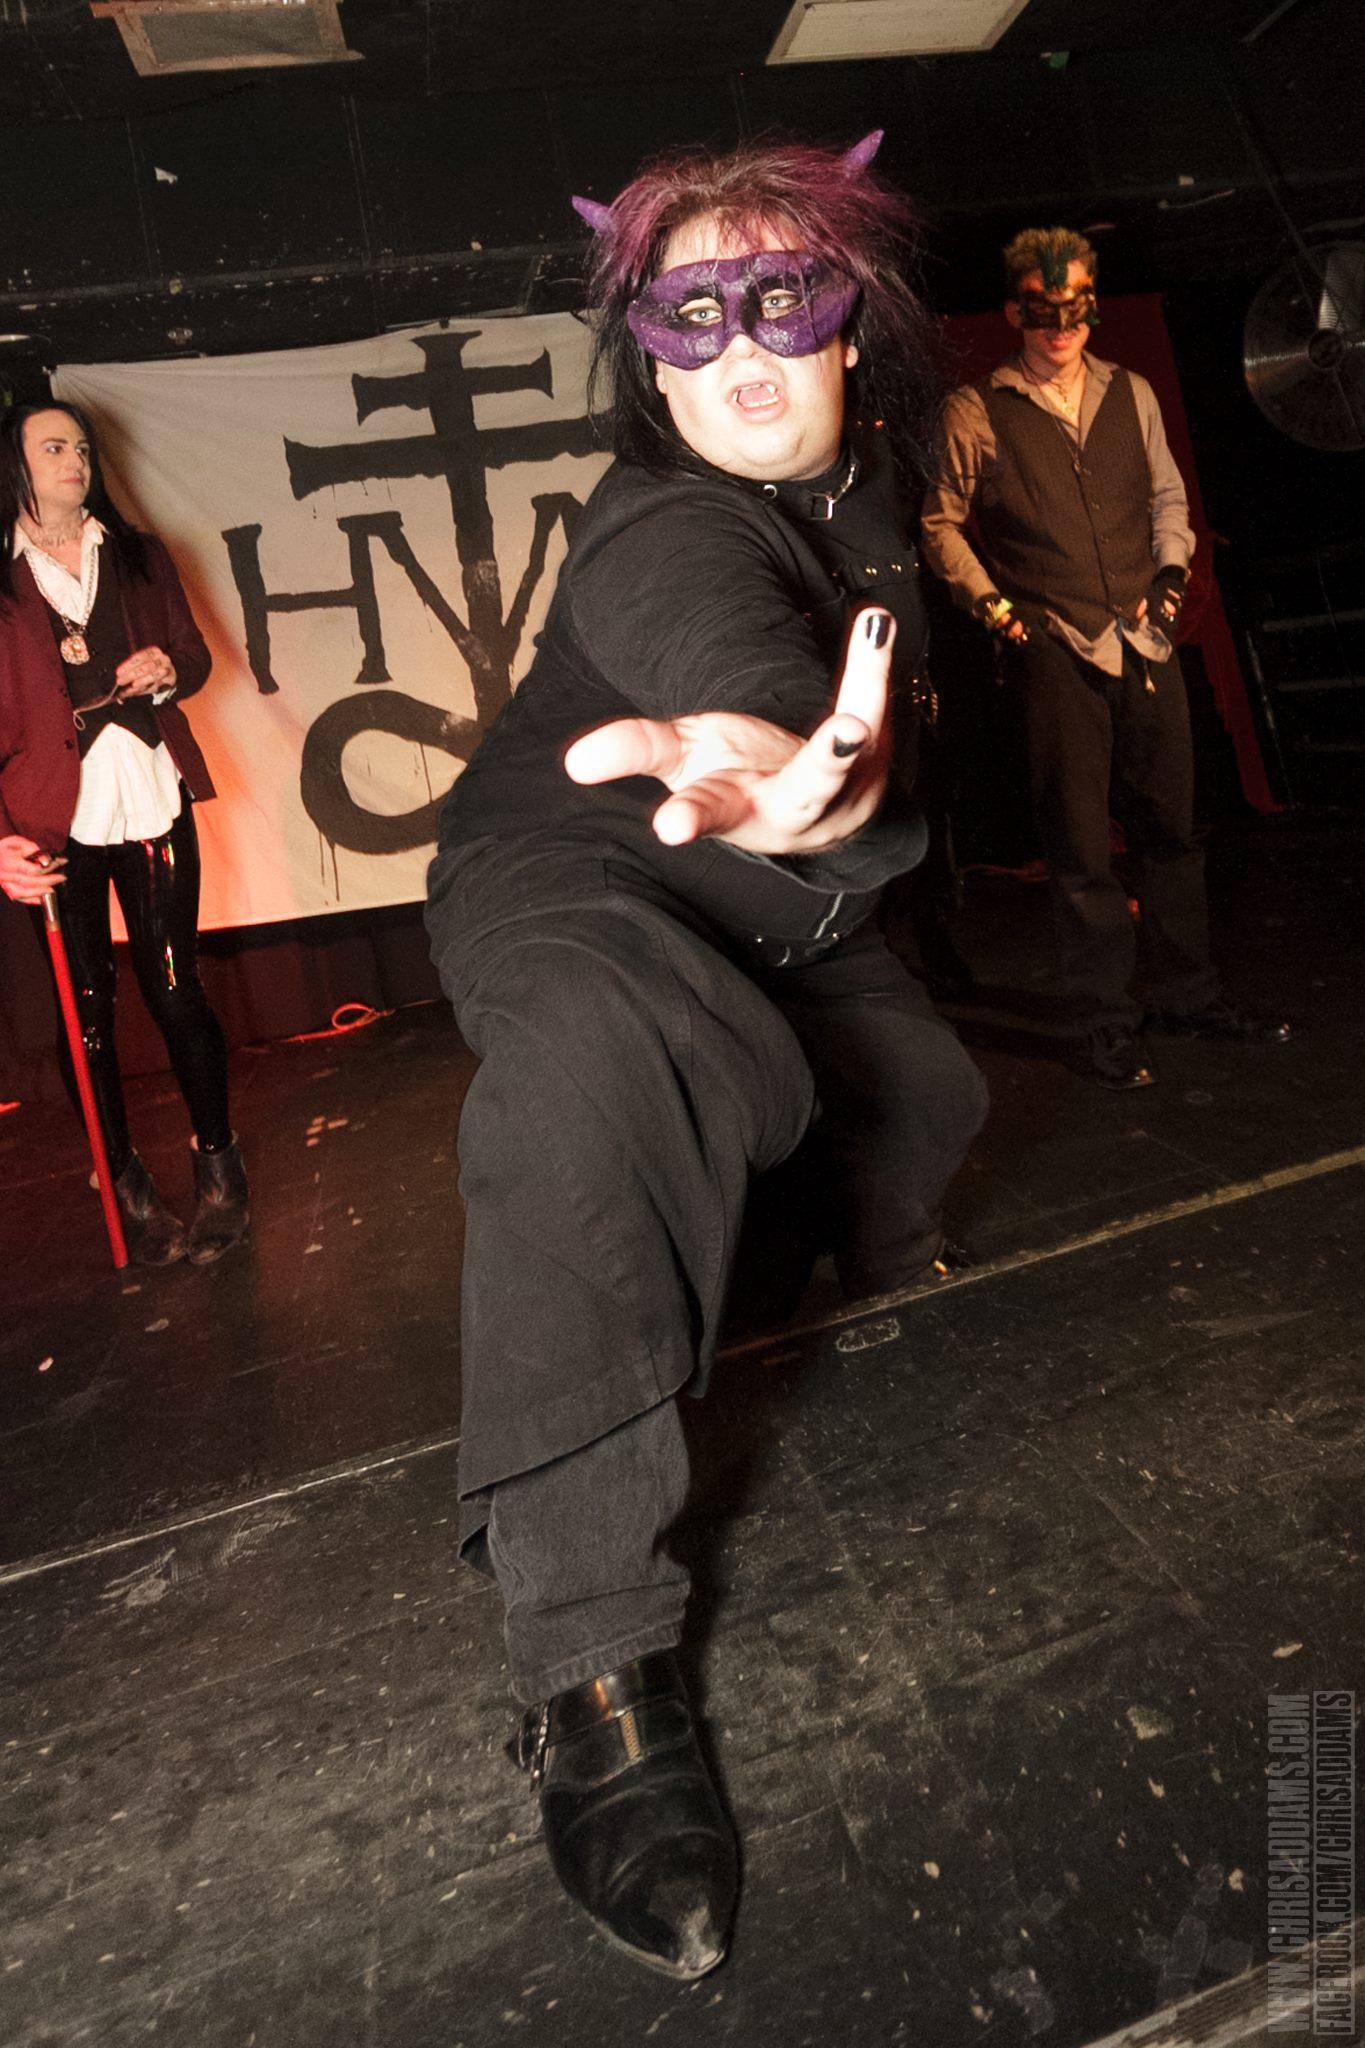 TheHavenClub-Goth-Industrial-Dance-Alternative-Northampton-MA (9).jpg